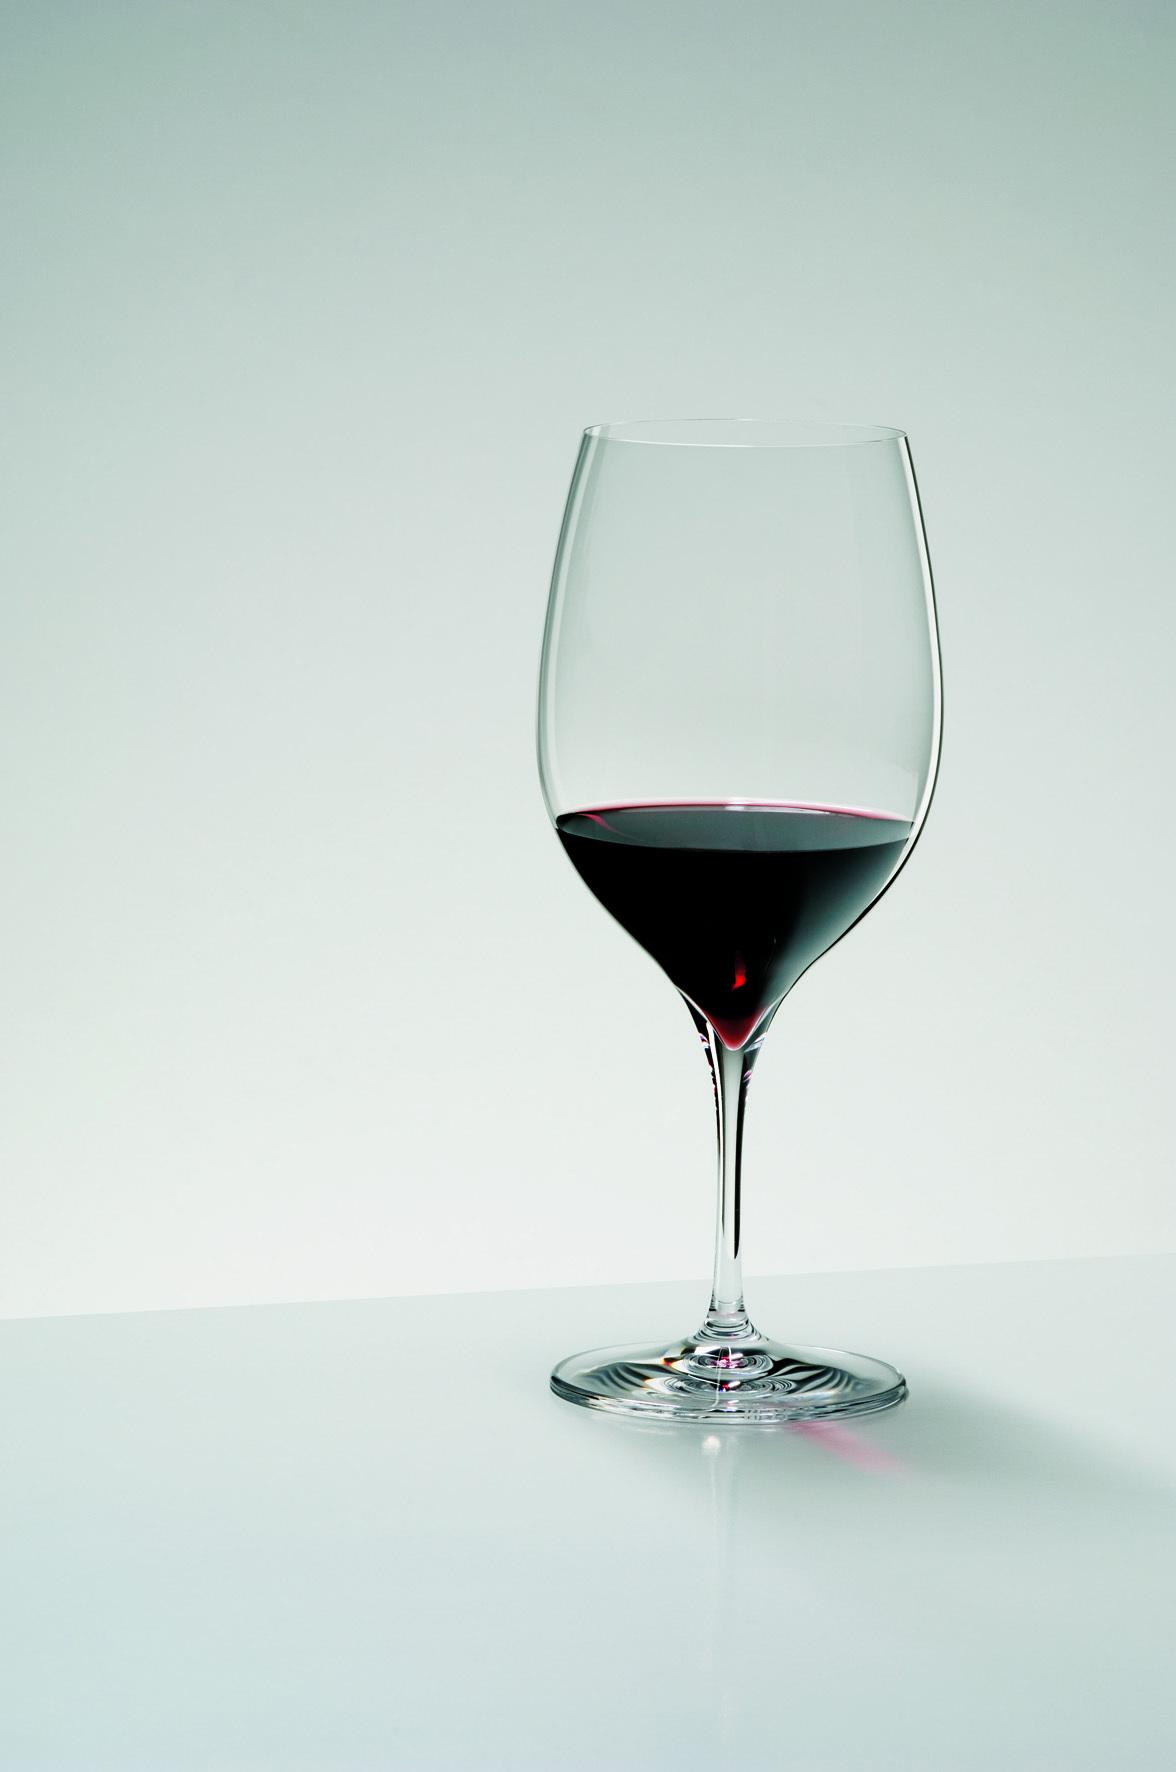 Бокалы Набор бокалов для красного вина 2 шт 750 мл Riedel Grape@Riedel Cabernet/Merlot nabor-bokalov-dlya-krasnogo-vina-2-sht-750-ml-riedel-graperiedel-cabernetmerlot-avstriya.jpg